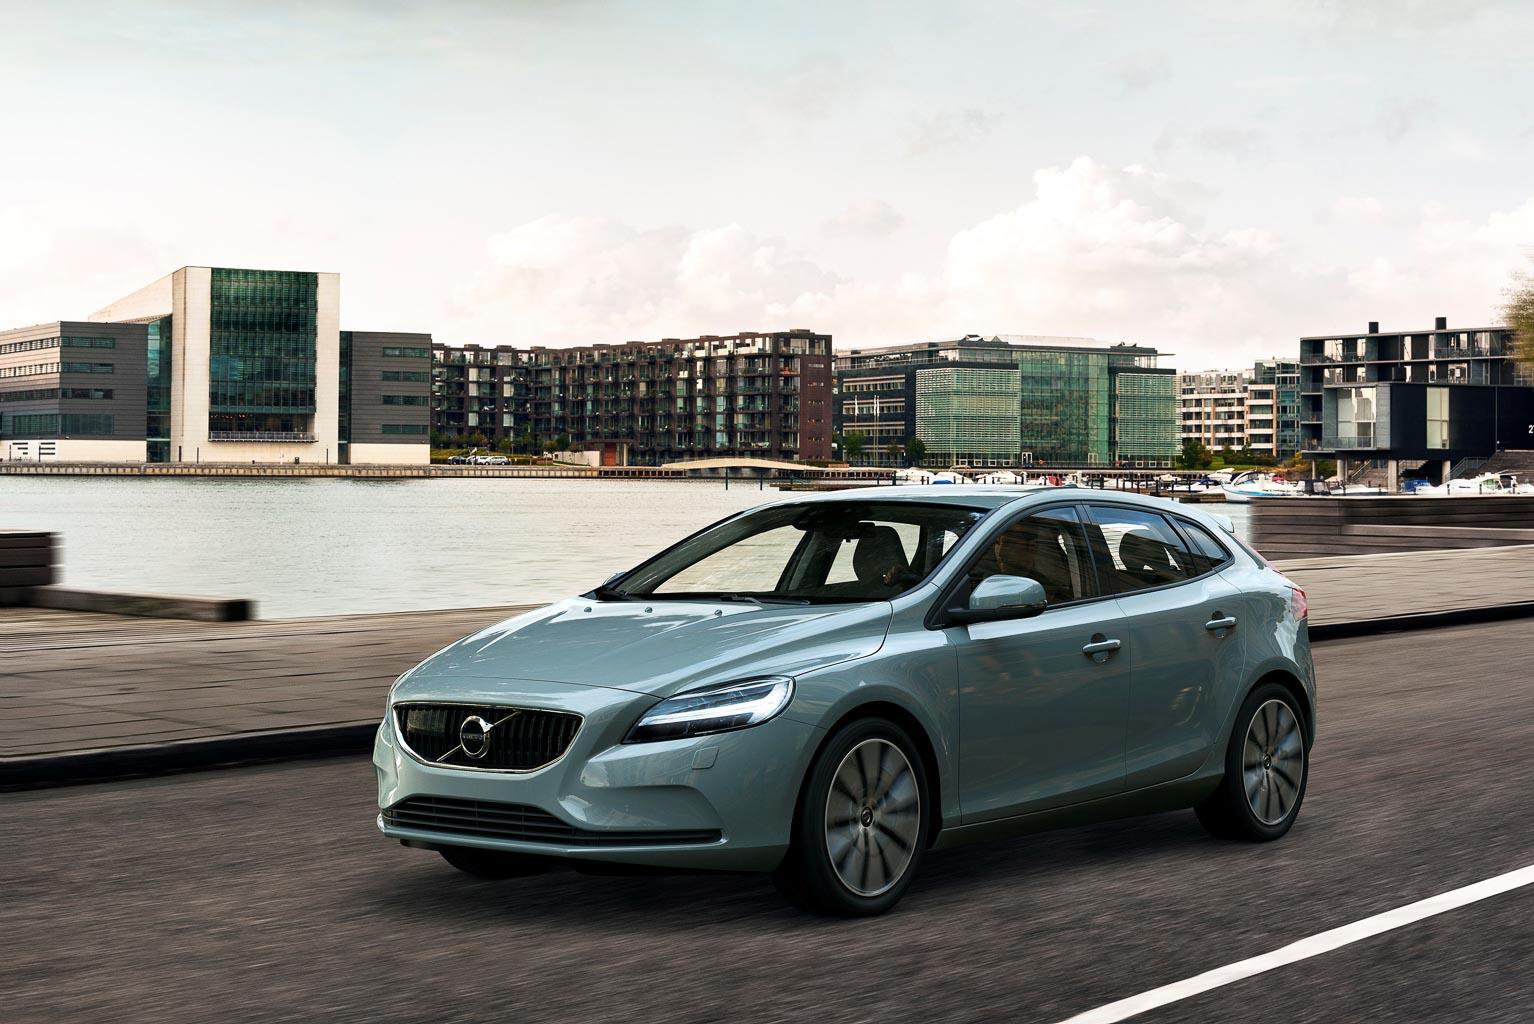 Genf: Facelift Volvo V40 | AWR Autoweltrevue Magazin